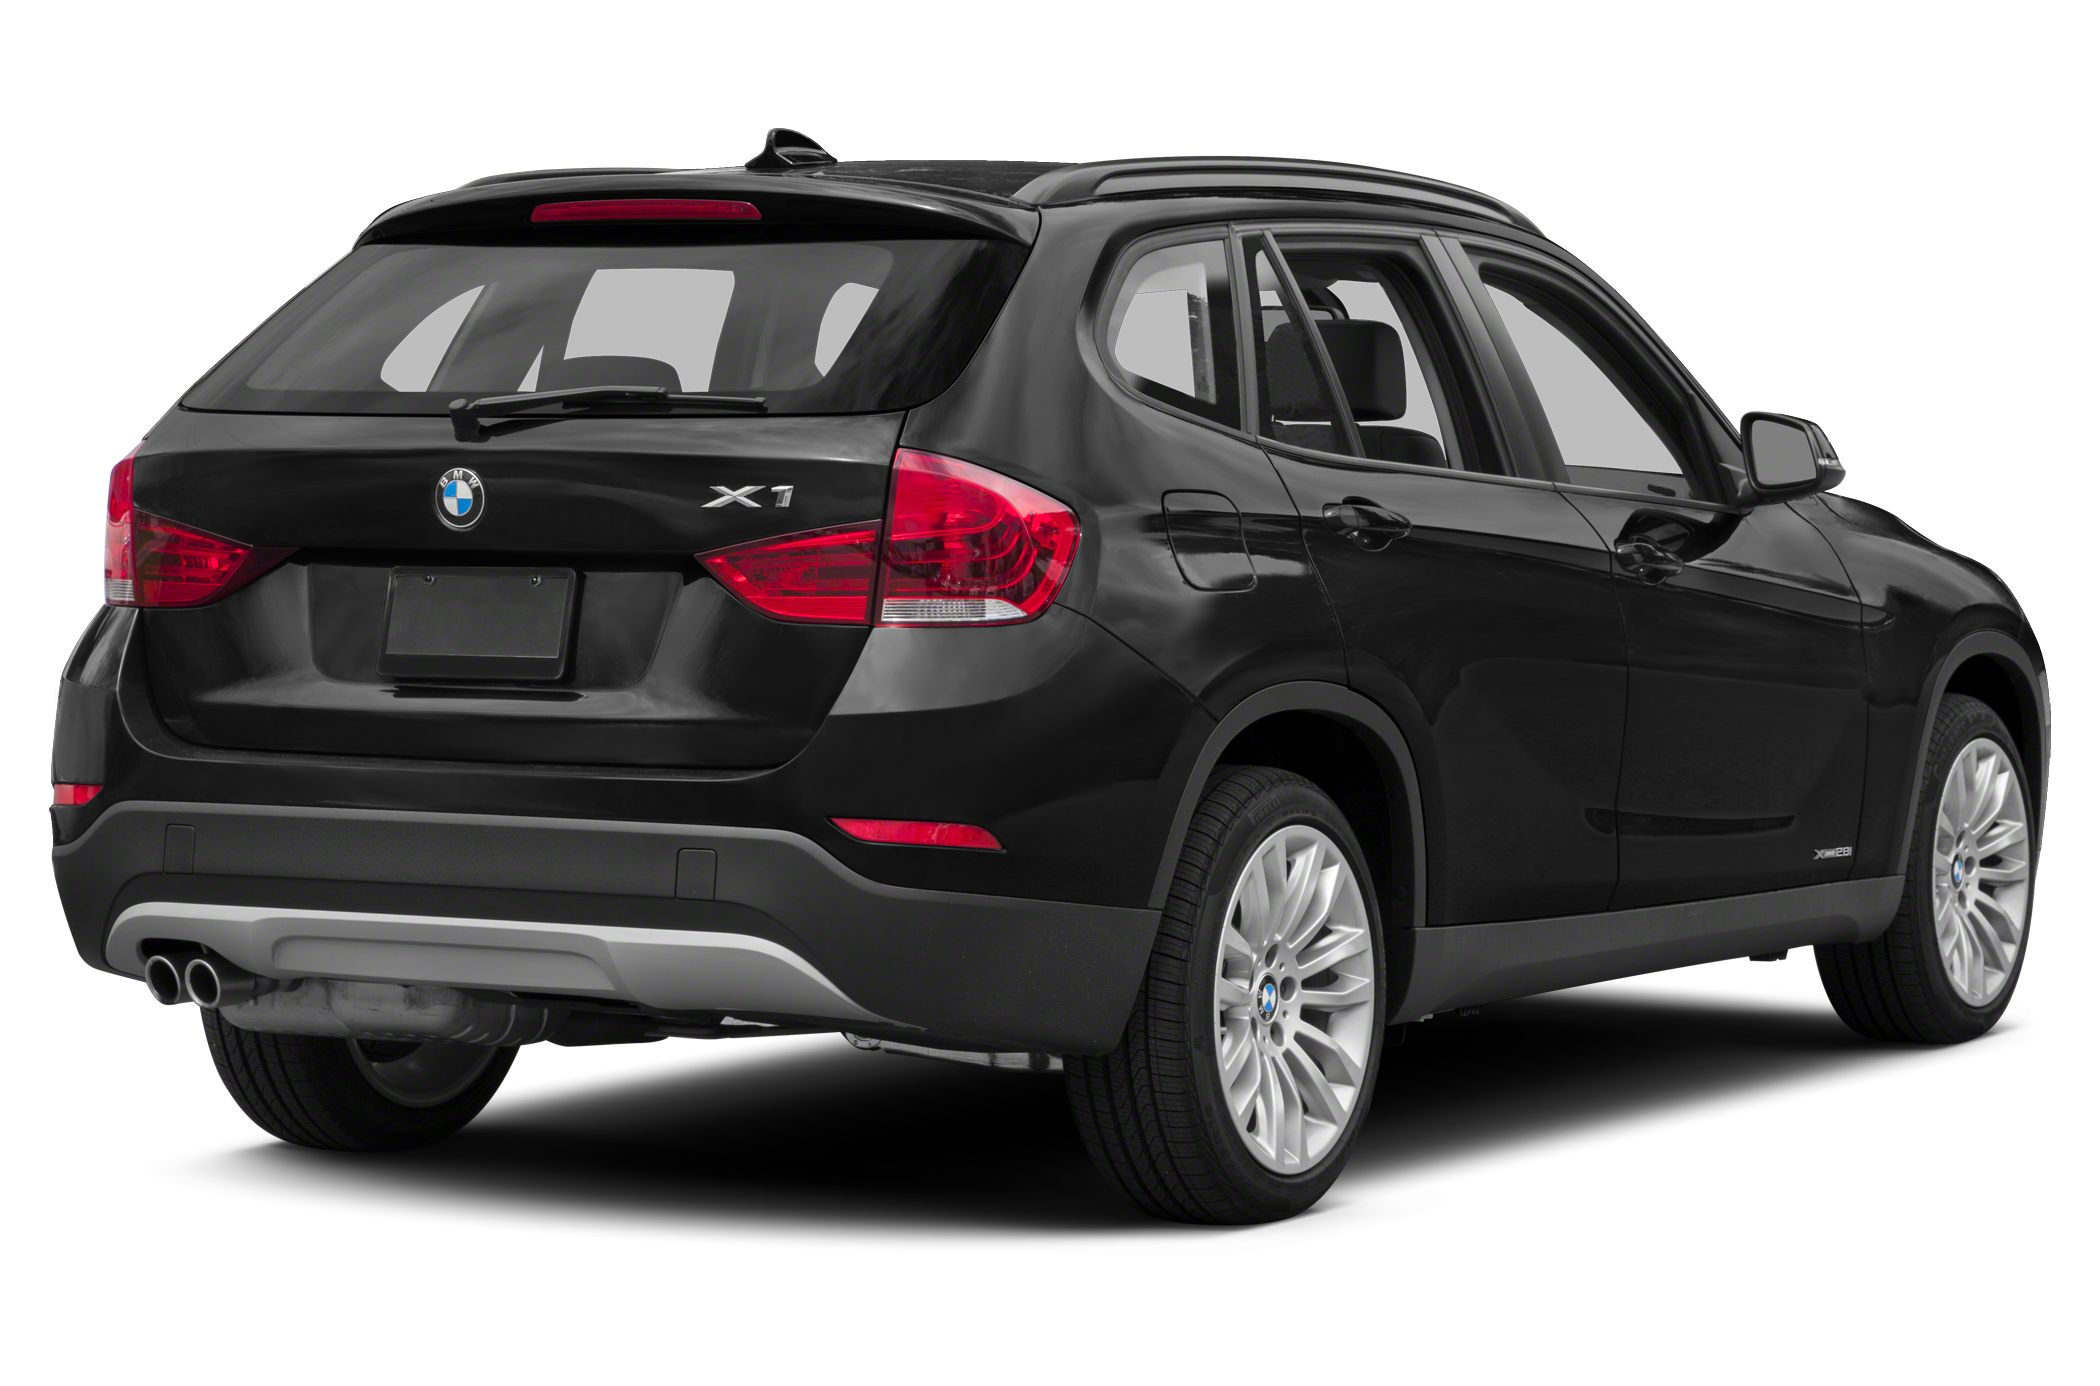 2015 BMW X1 xDrive28i Clean CARFAX Midnight 2015 BMW X1 xDrive28i AWD 20L 4-Cylinder DOHC 16V Tw